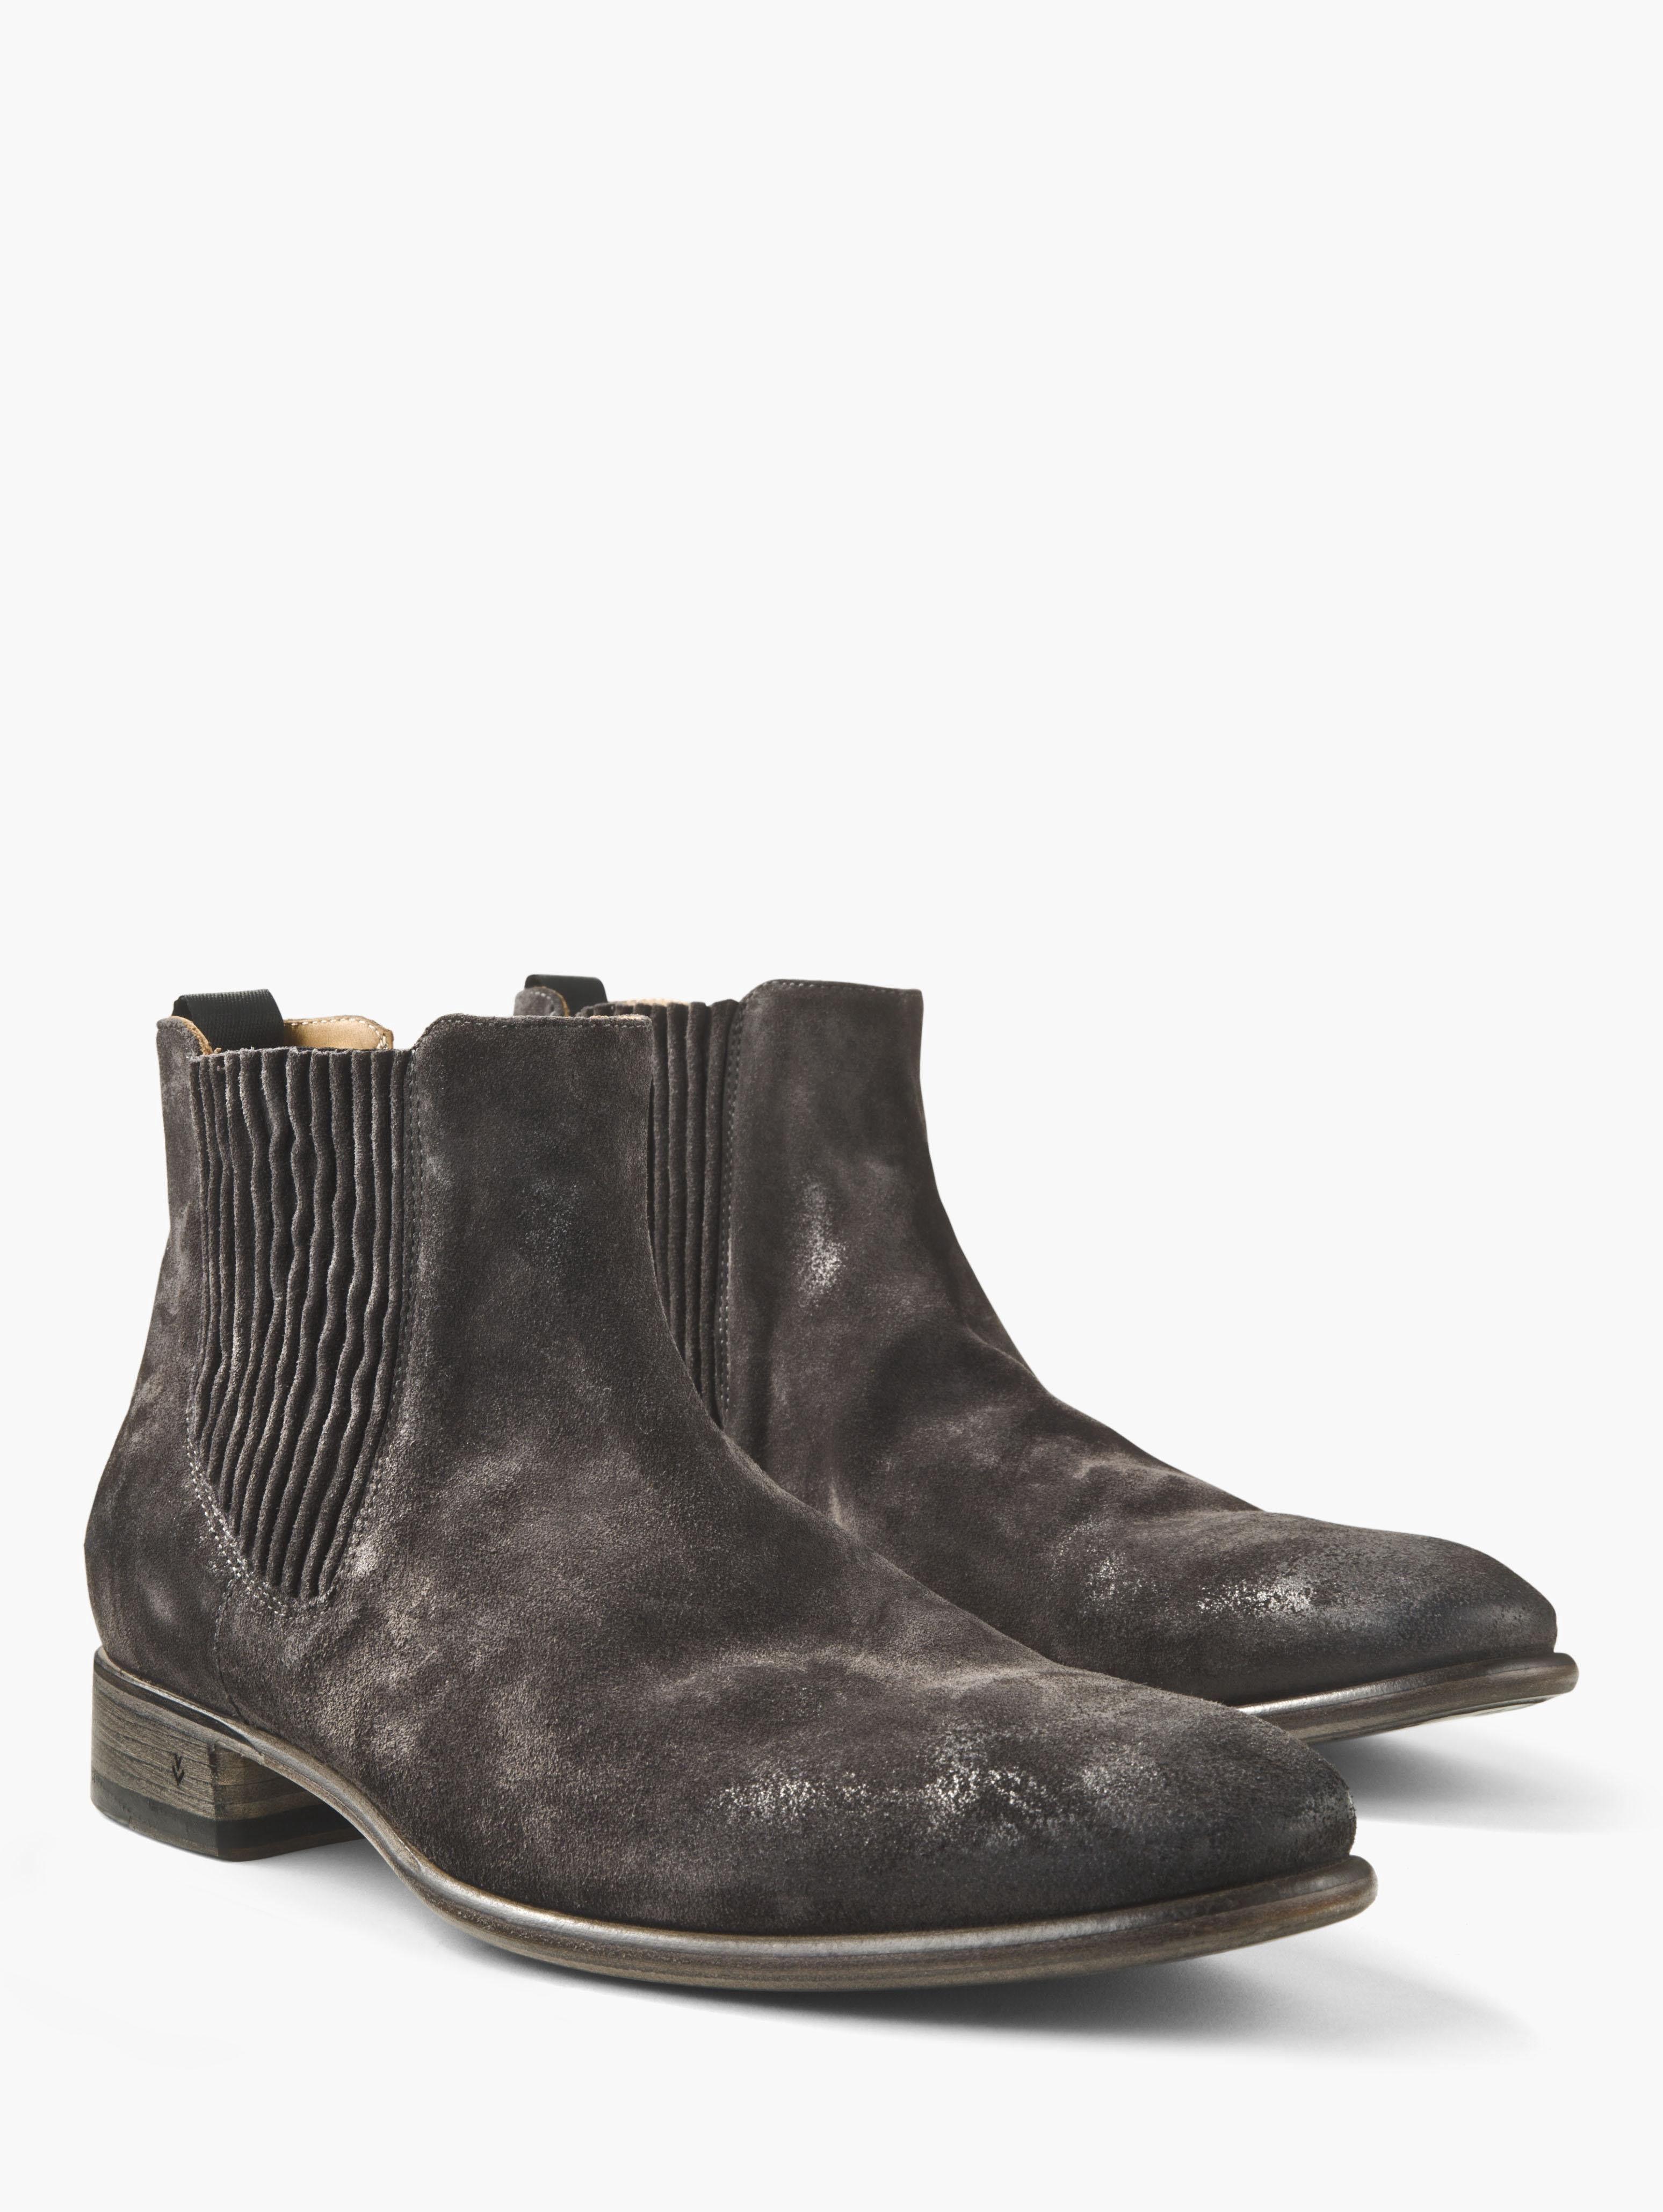 29b25584c0c899 JOHN VARVATOS Eldridge Covered Chelsea - Lead.  johnvarvatos  shoes  all